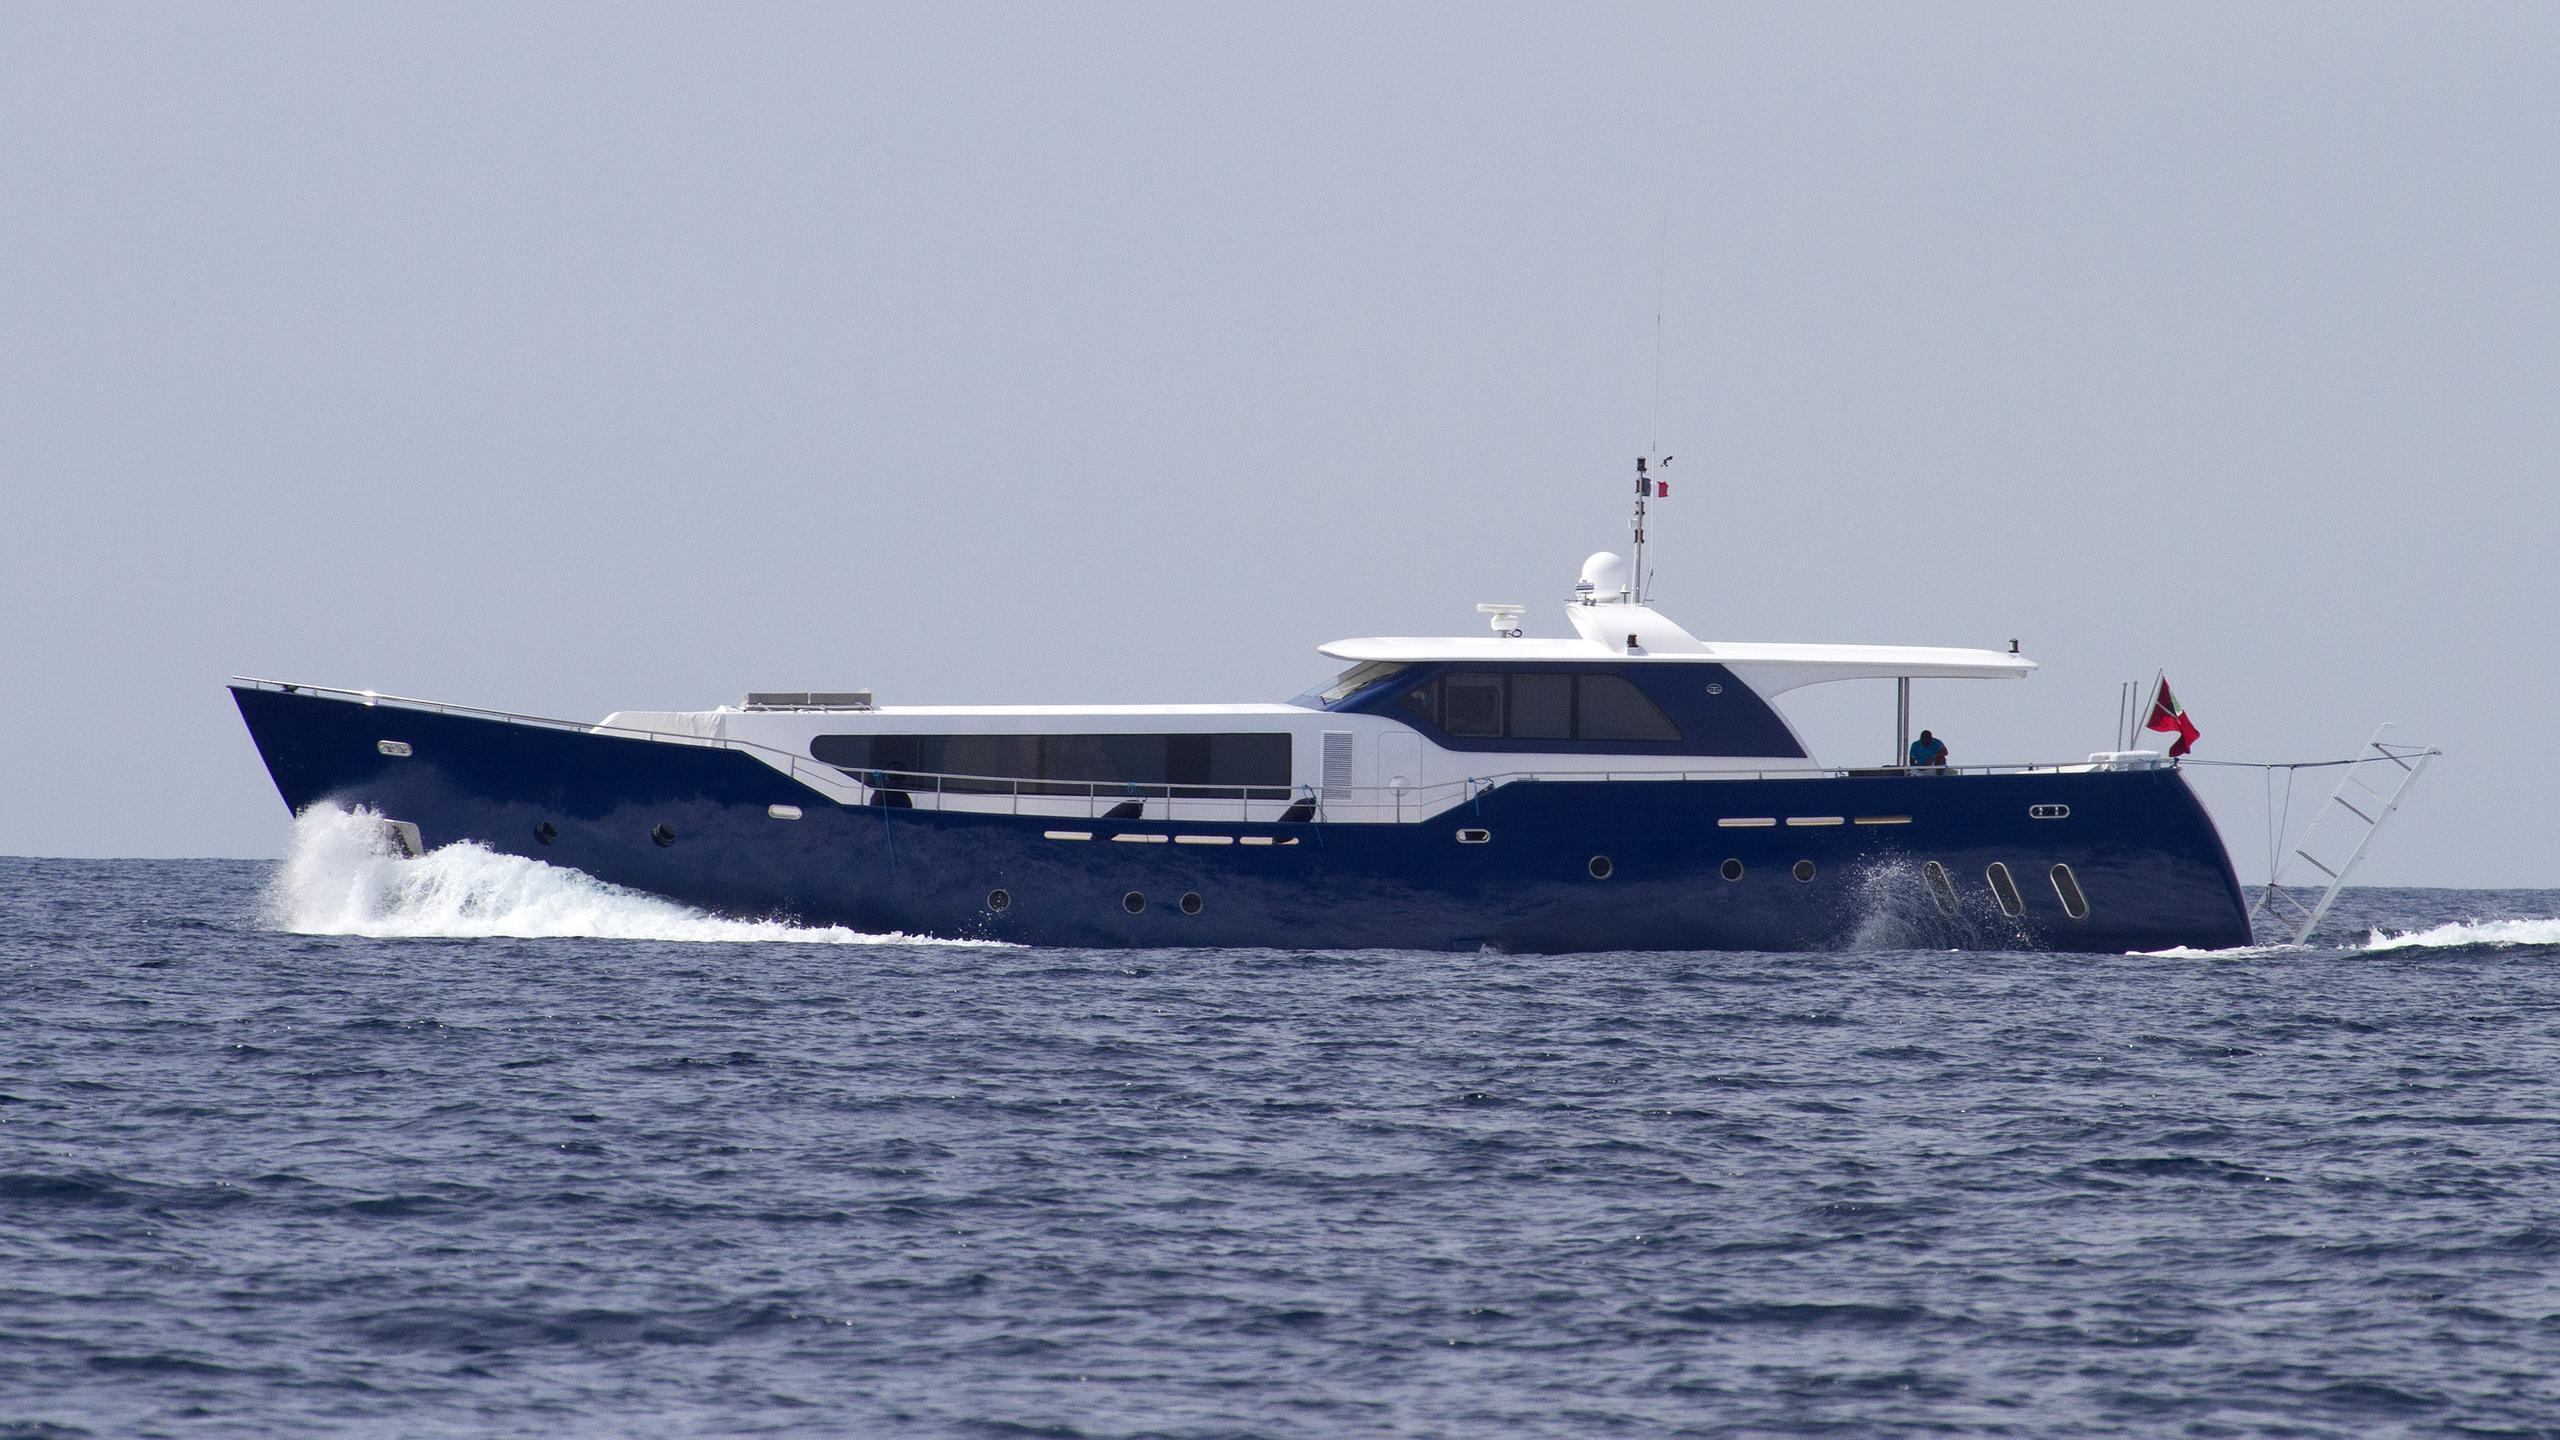 ad5-motoryacht-agantur-32m-2011-running-profile